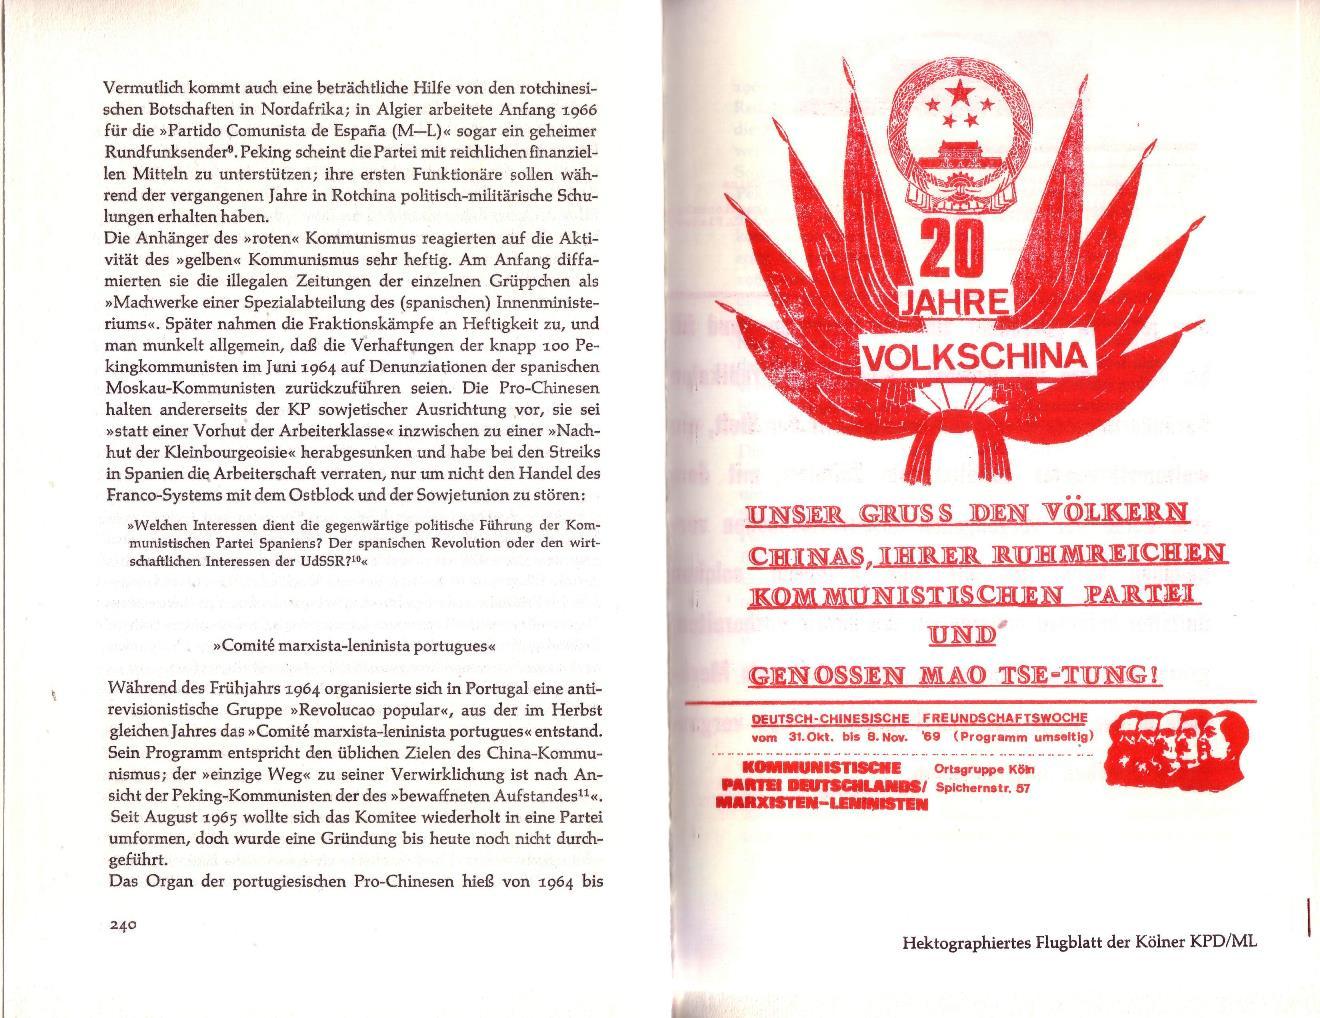 Schlomann_Friedlingstein_Die_Maoisten_0125